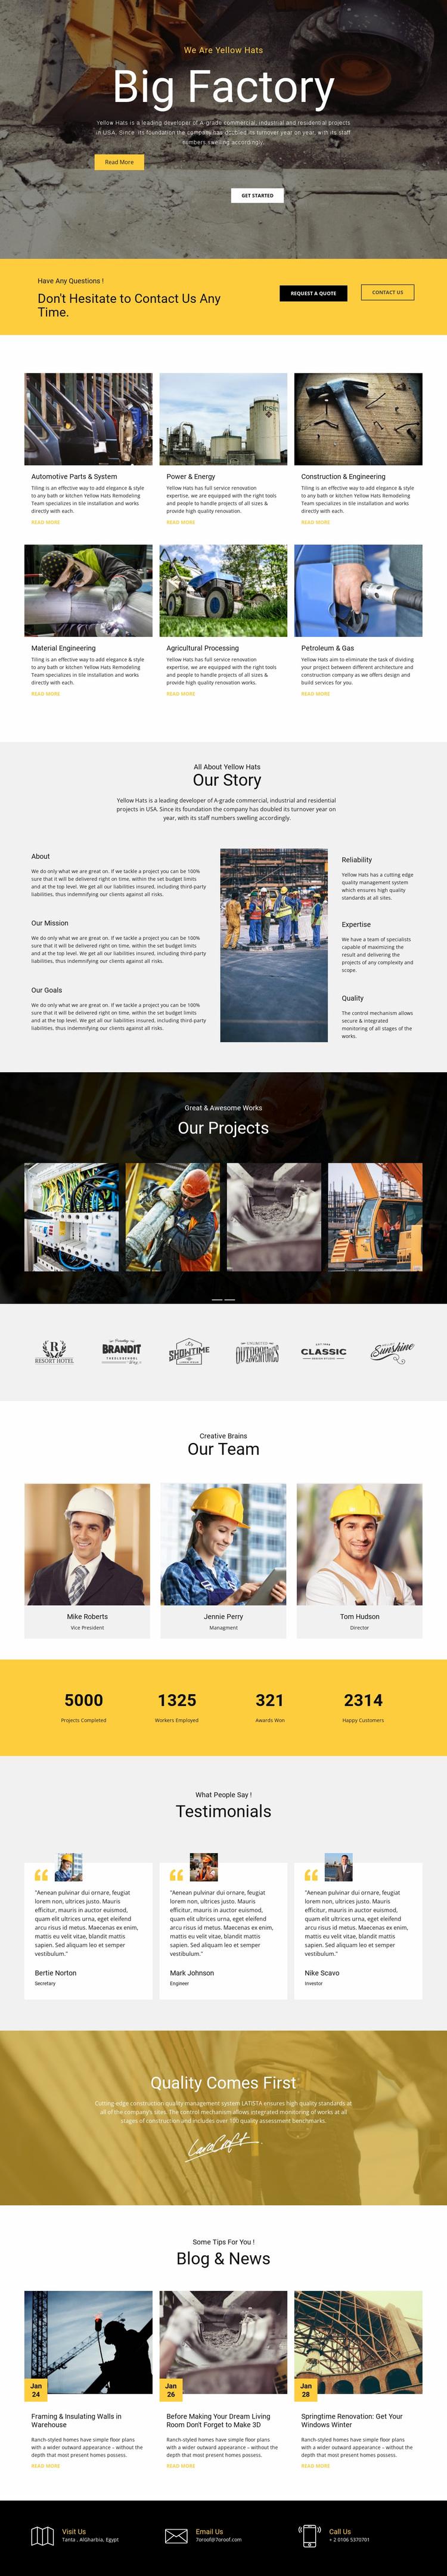 Factory works industrial Website Design